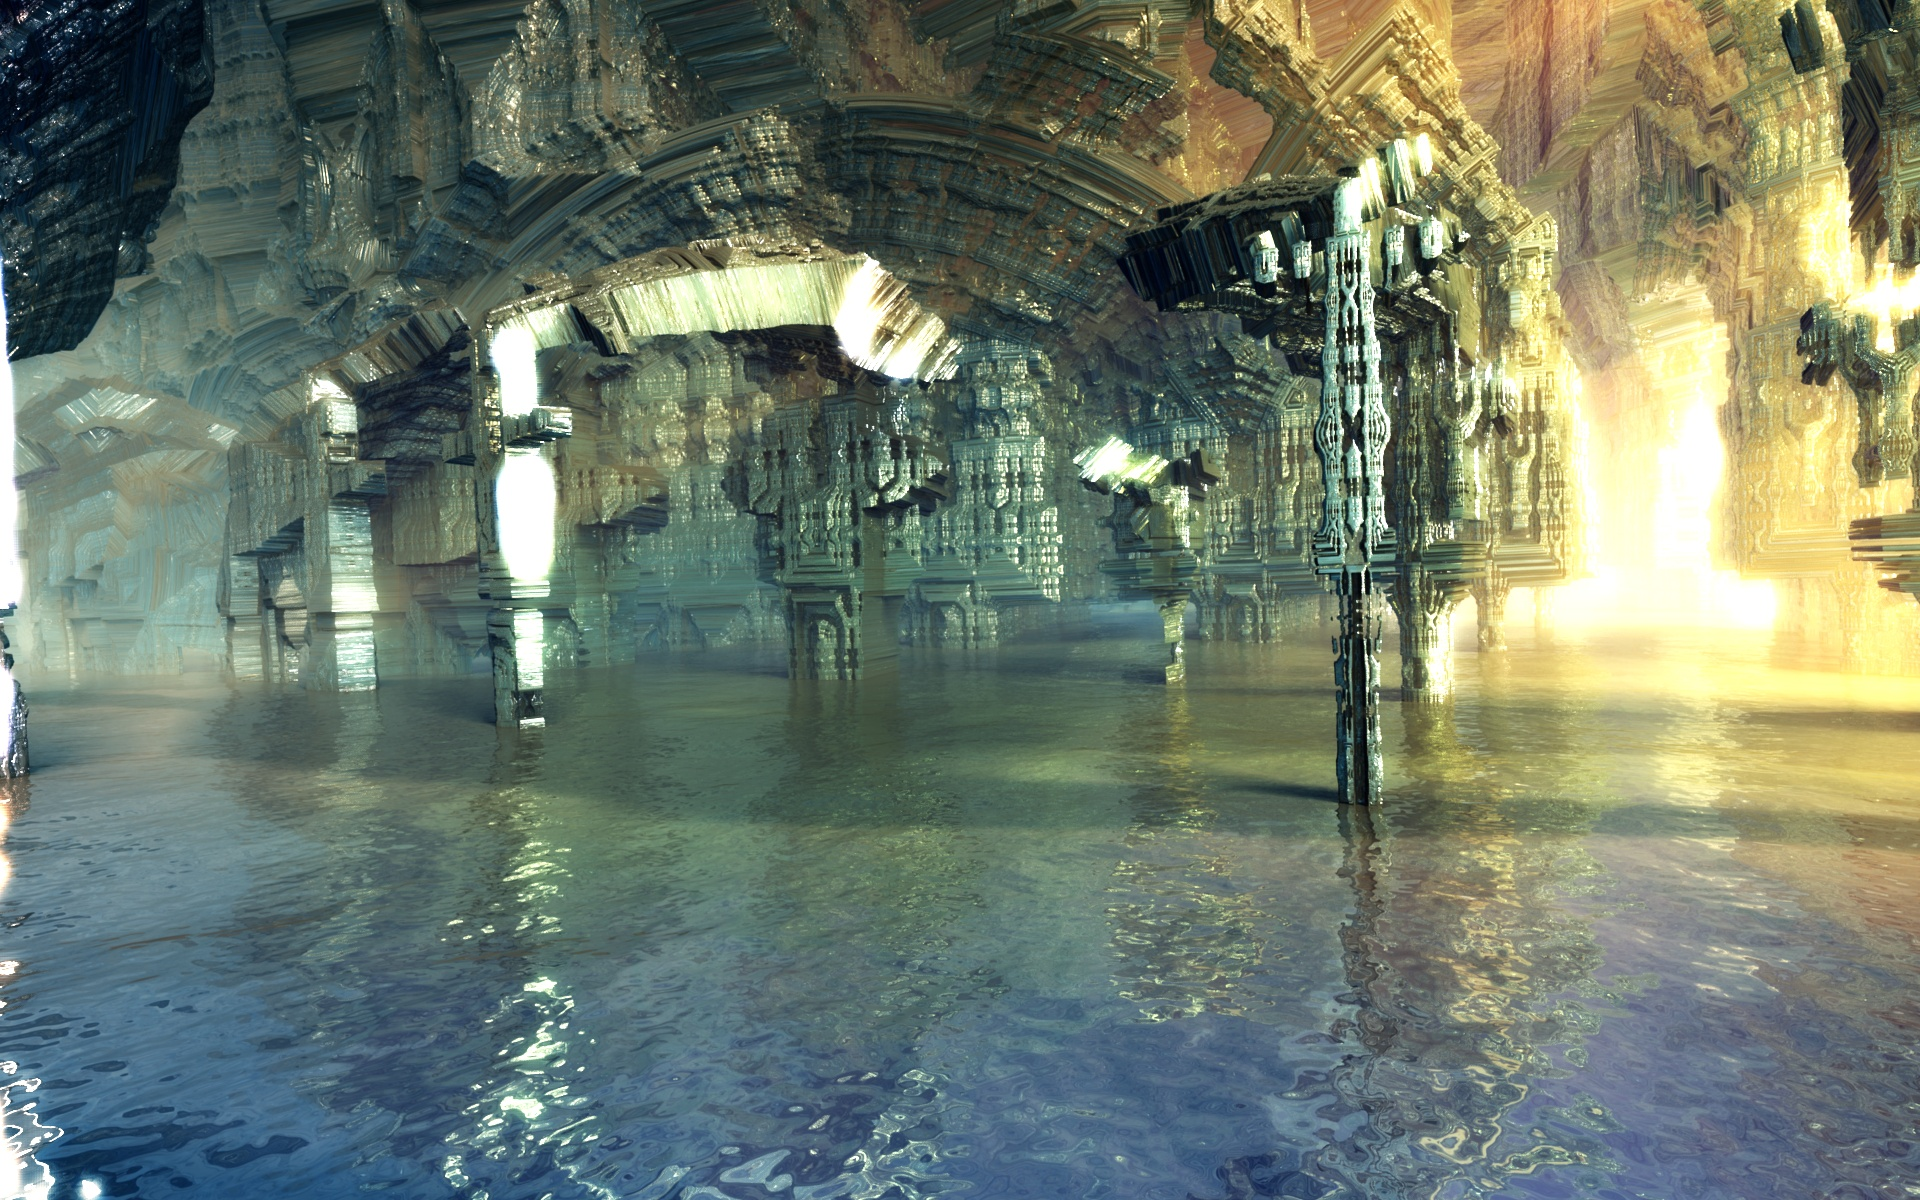 Dwemer ruins by Crist-JRoger